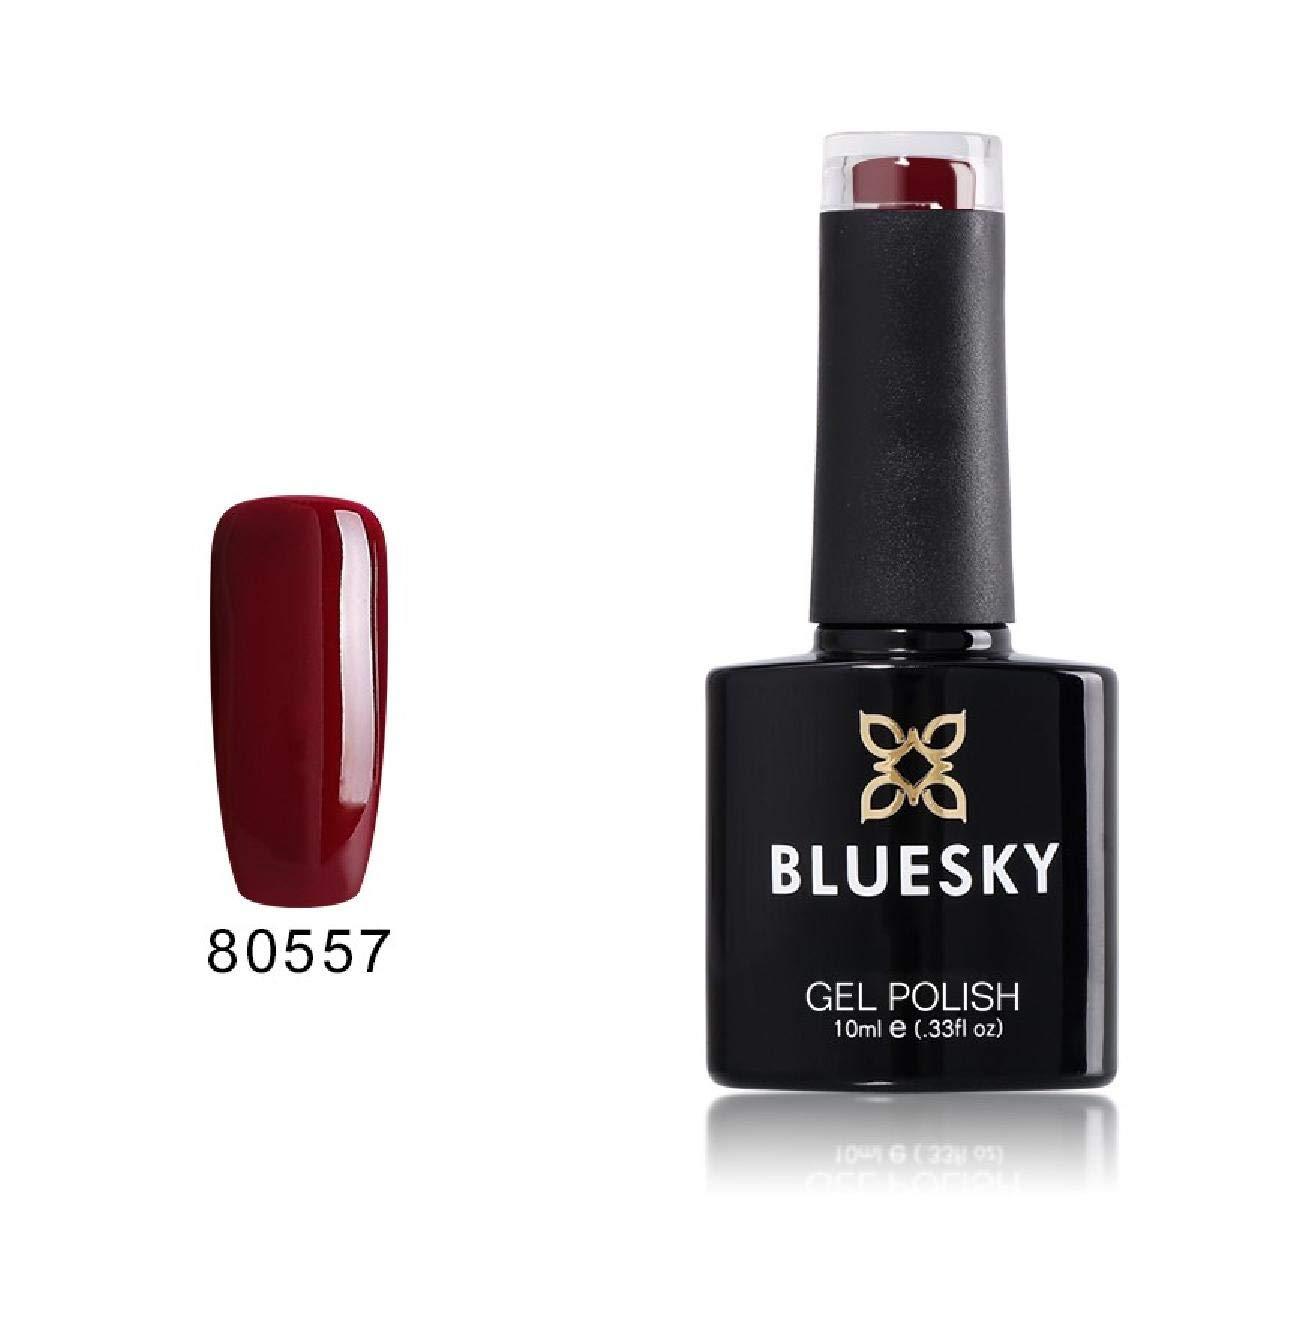 fd92b17d6d44 Bluesky UV/LED Gel Soak Off Polish, Tinted Love, 80557, 10 ml ...